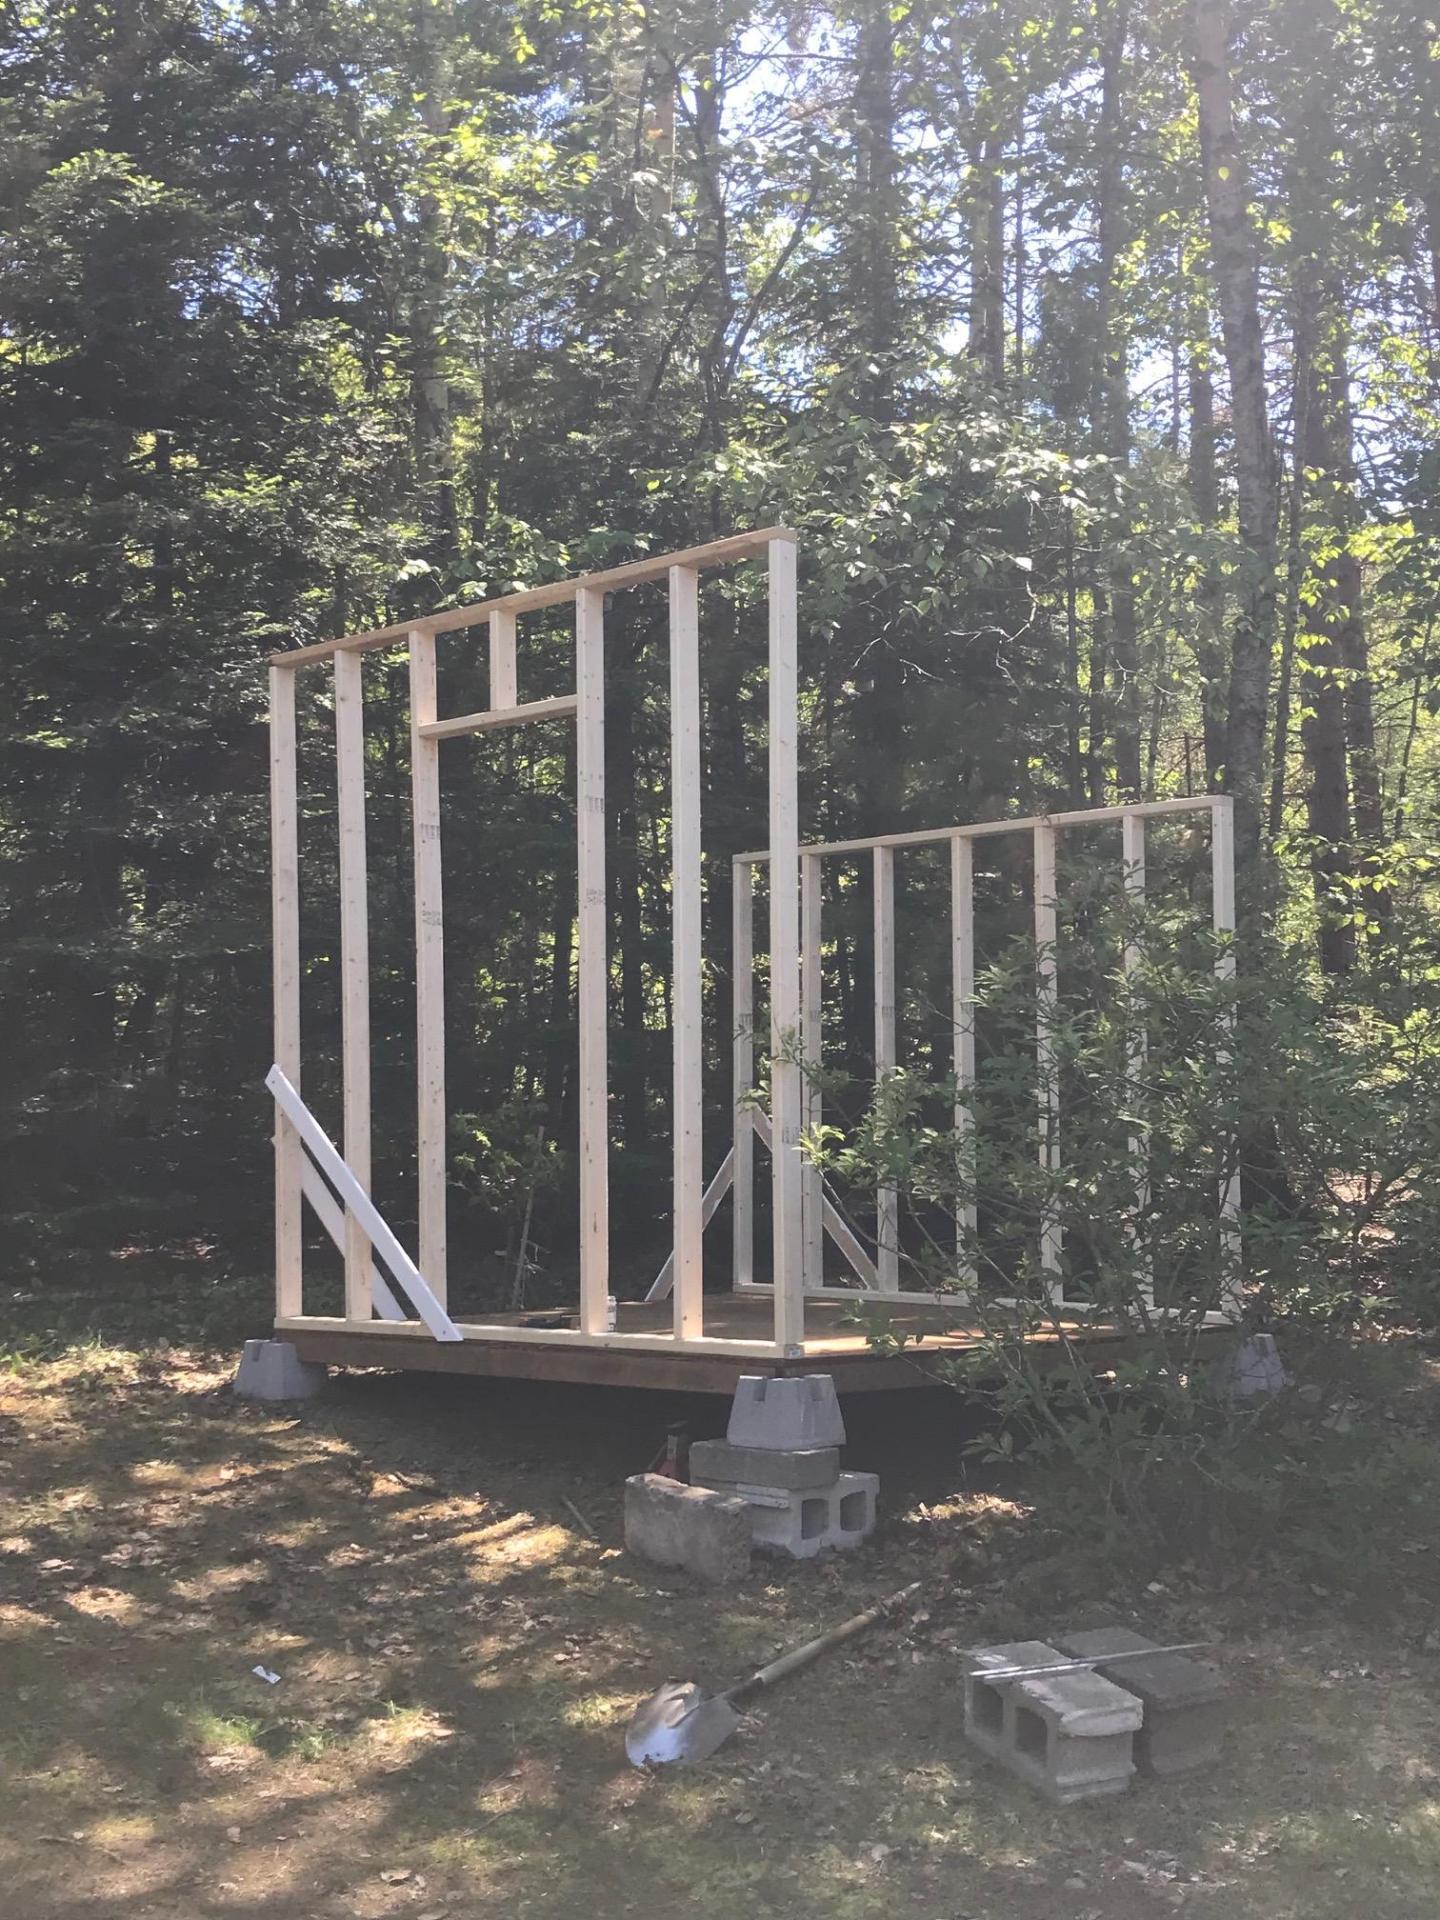 Raising Walls for Chicken Coop